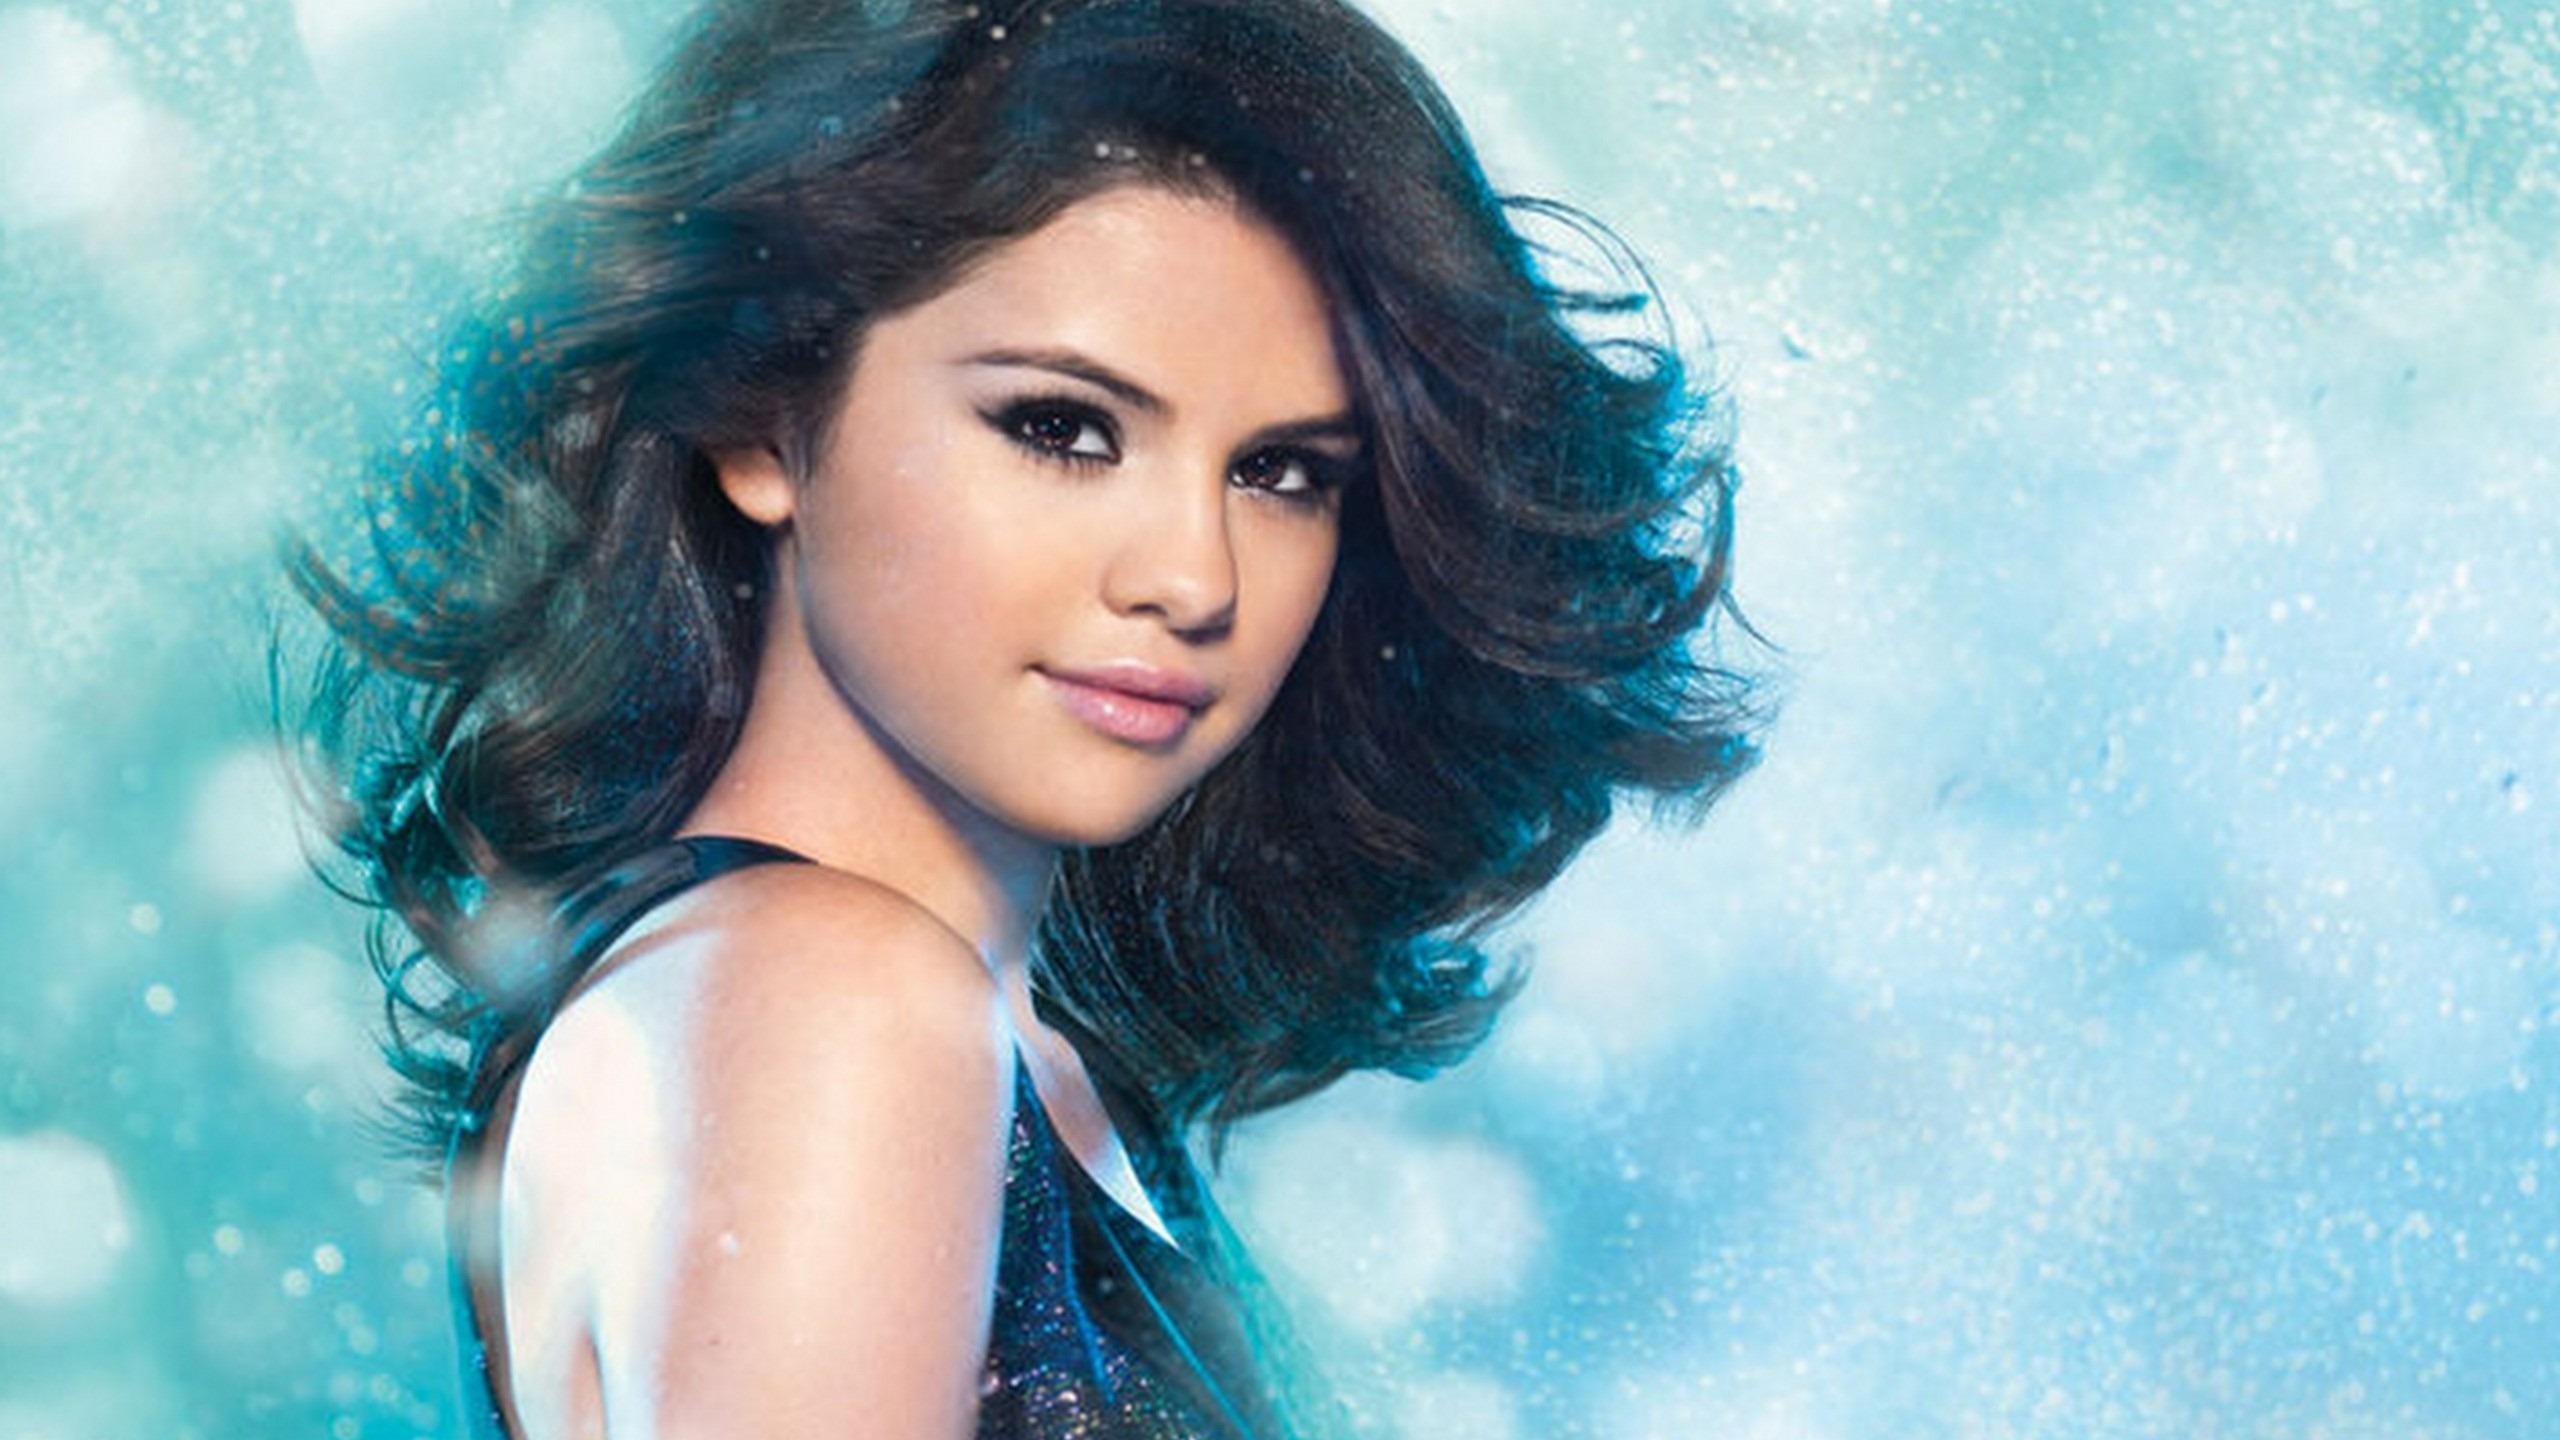 Selena Gomez Desktop Backgrounds High Quality Wallpapers 2560x1440